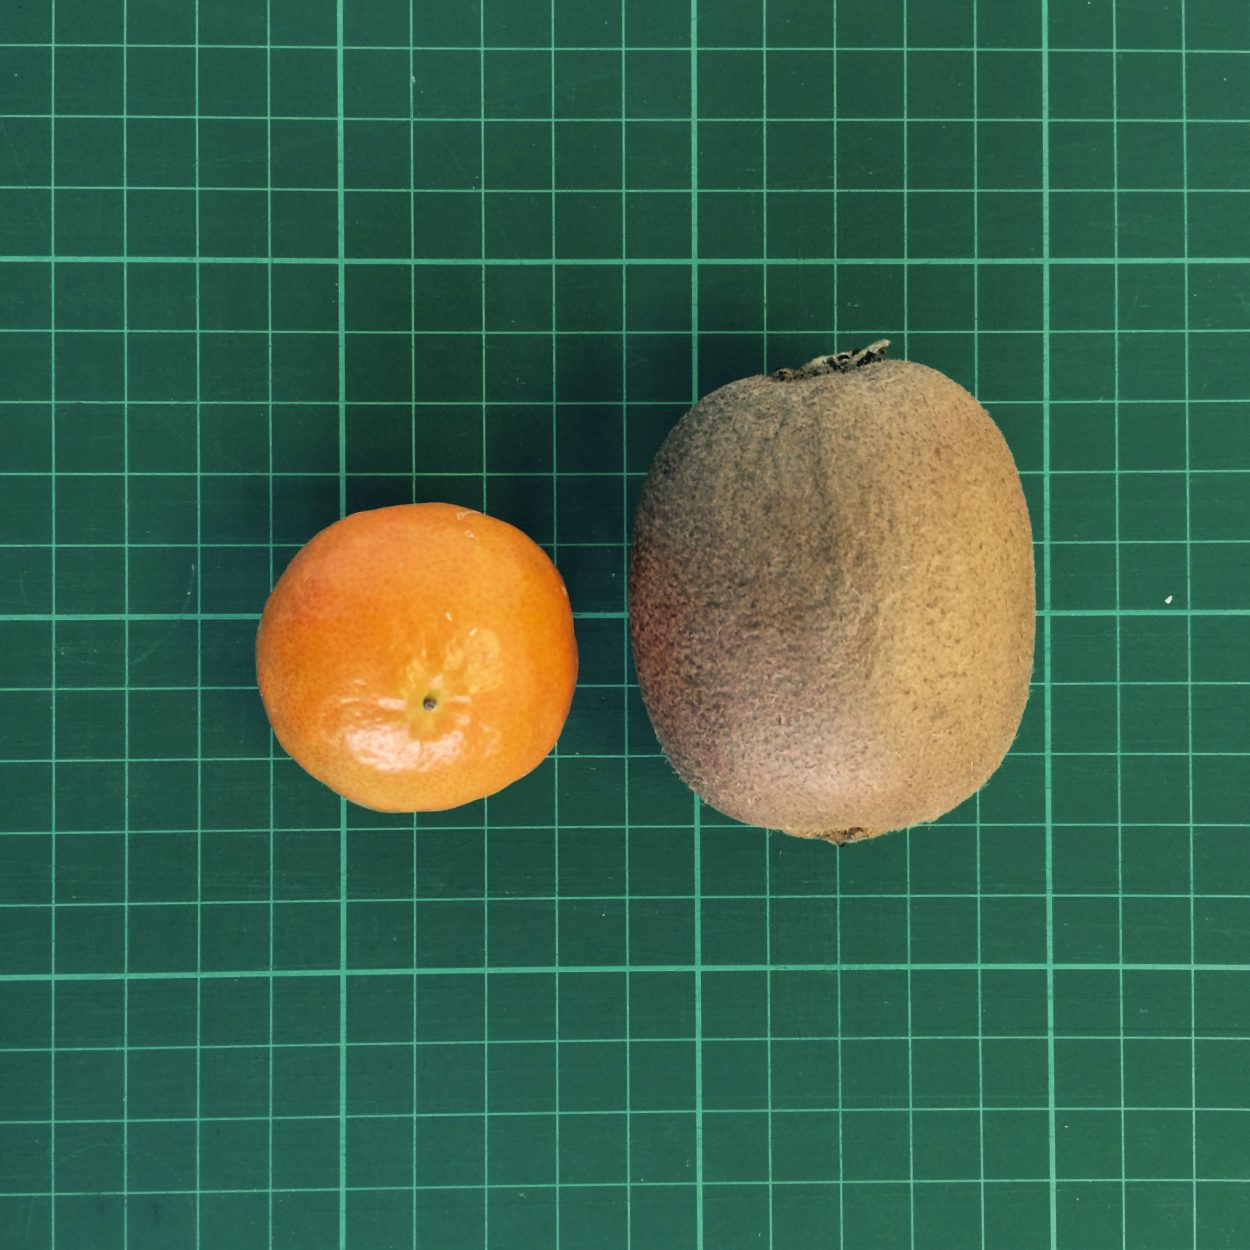 A tiny tangerine next to a kiwi on a cutting mat